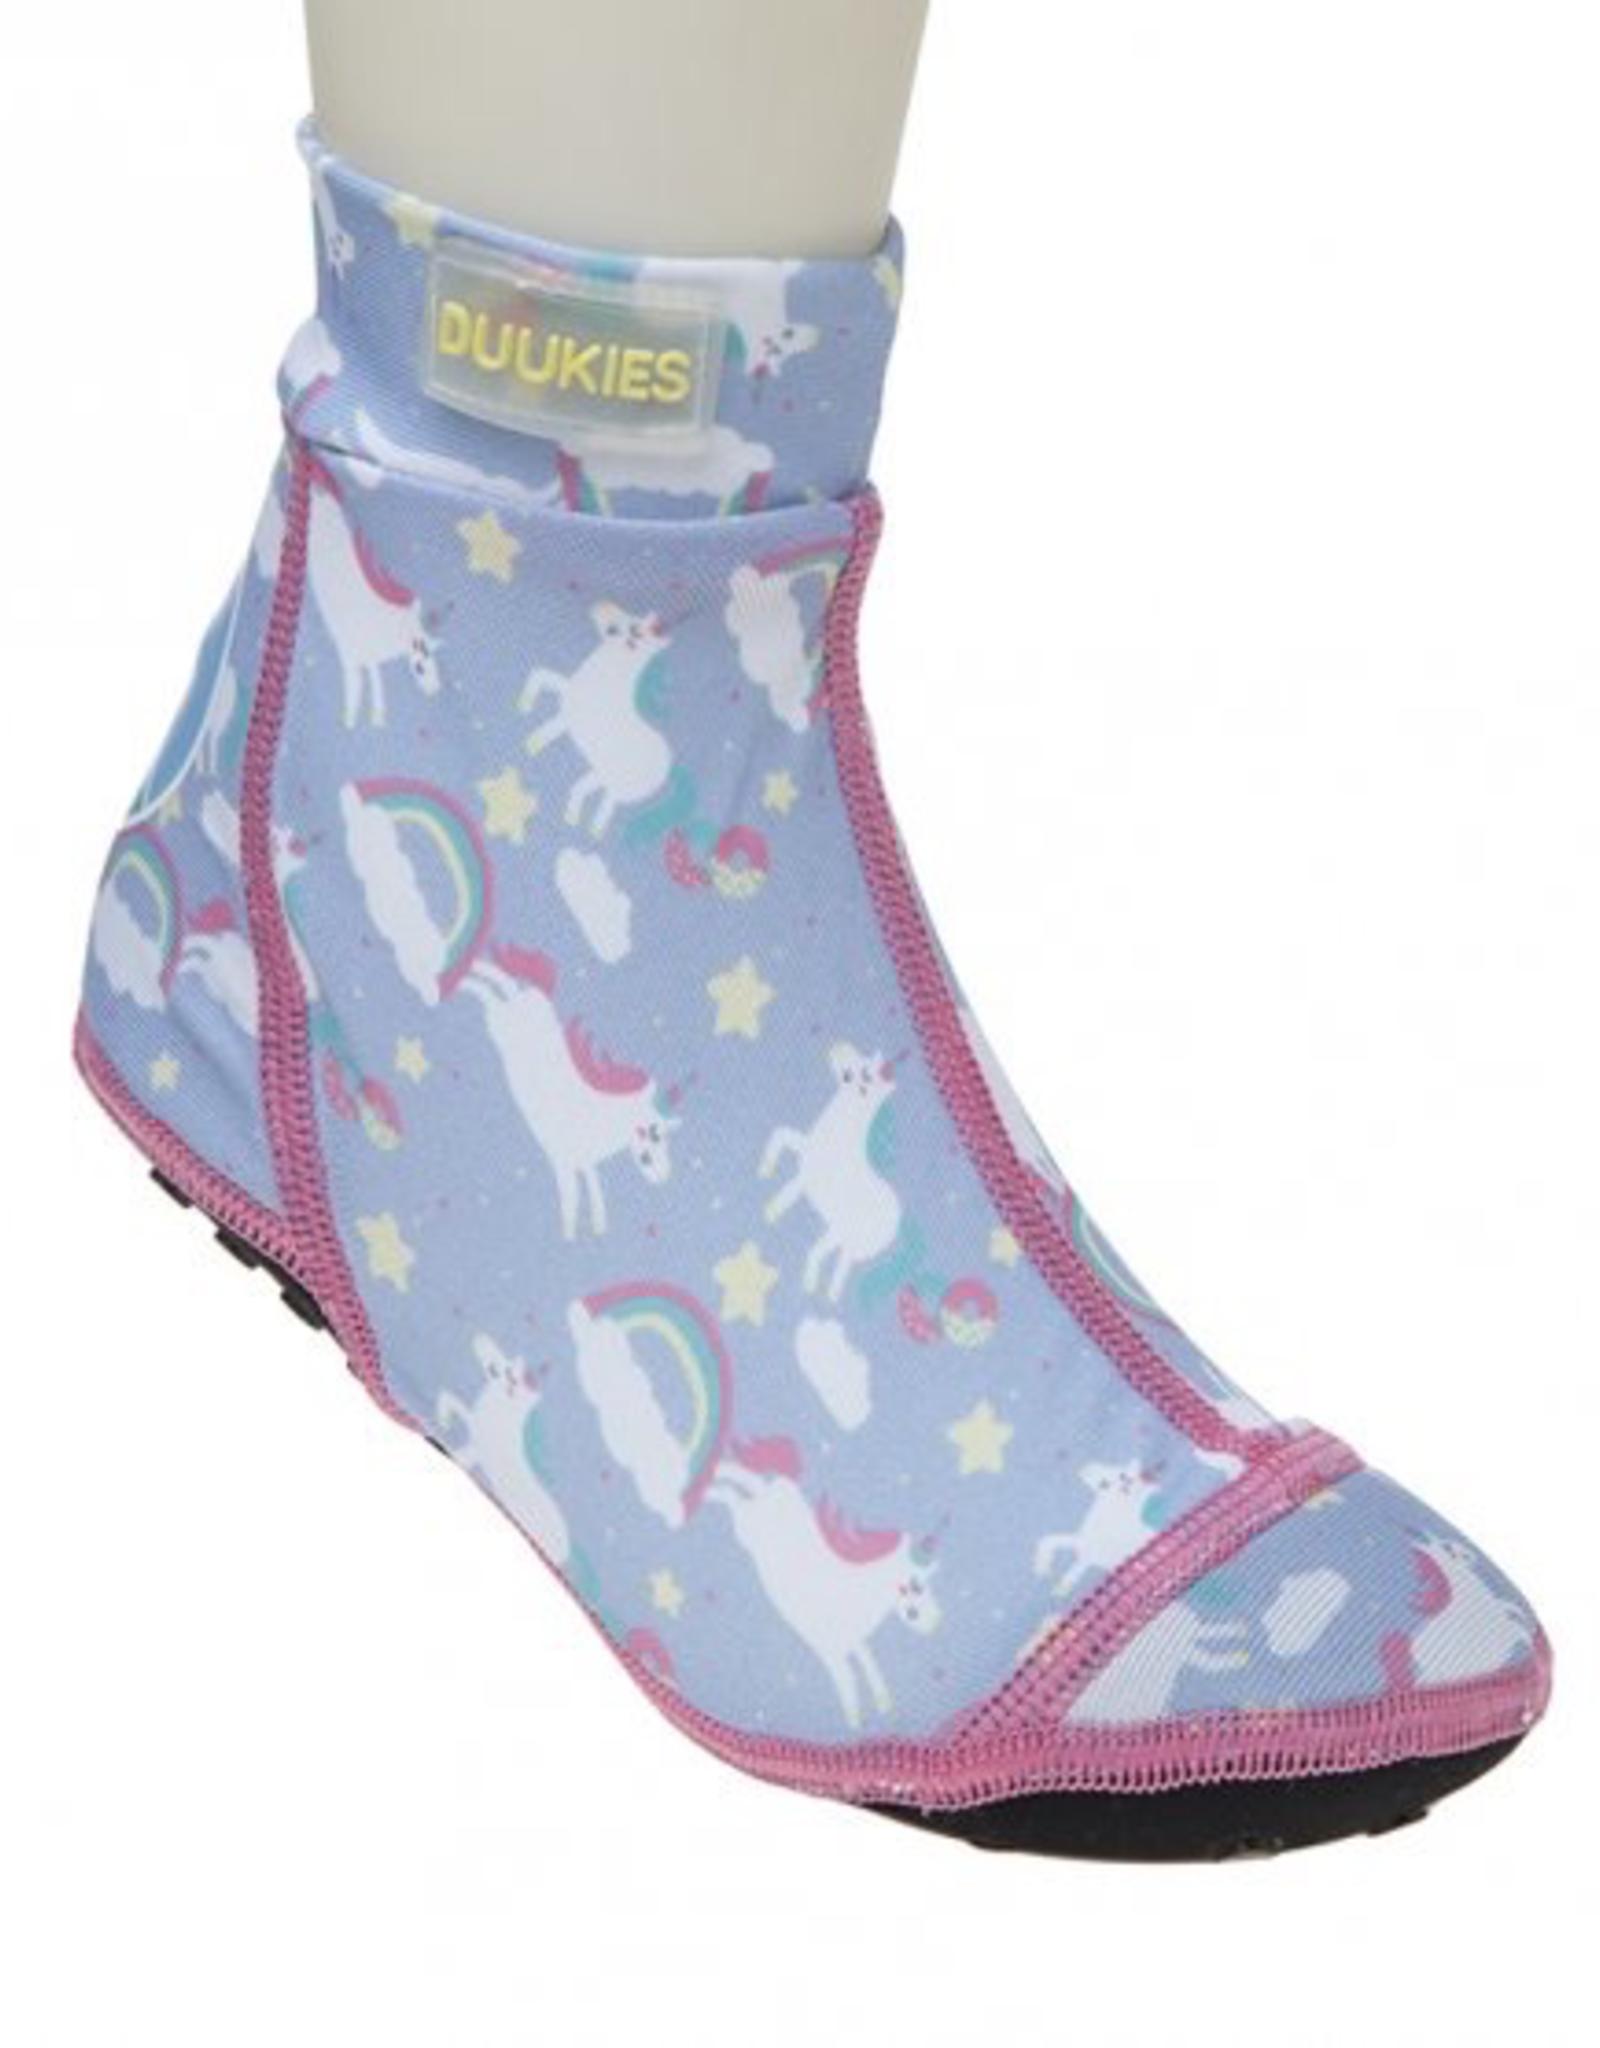 Duukies Beach Socks for Girl